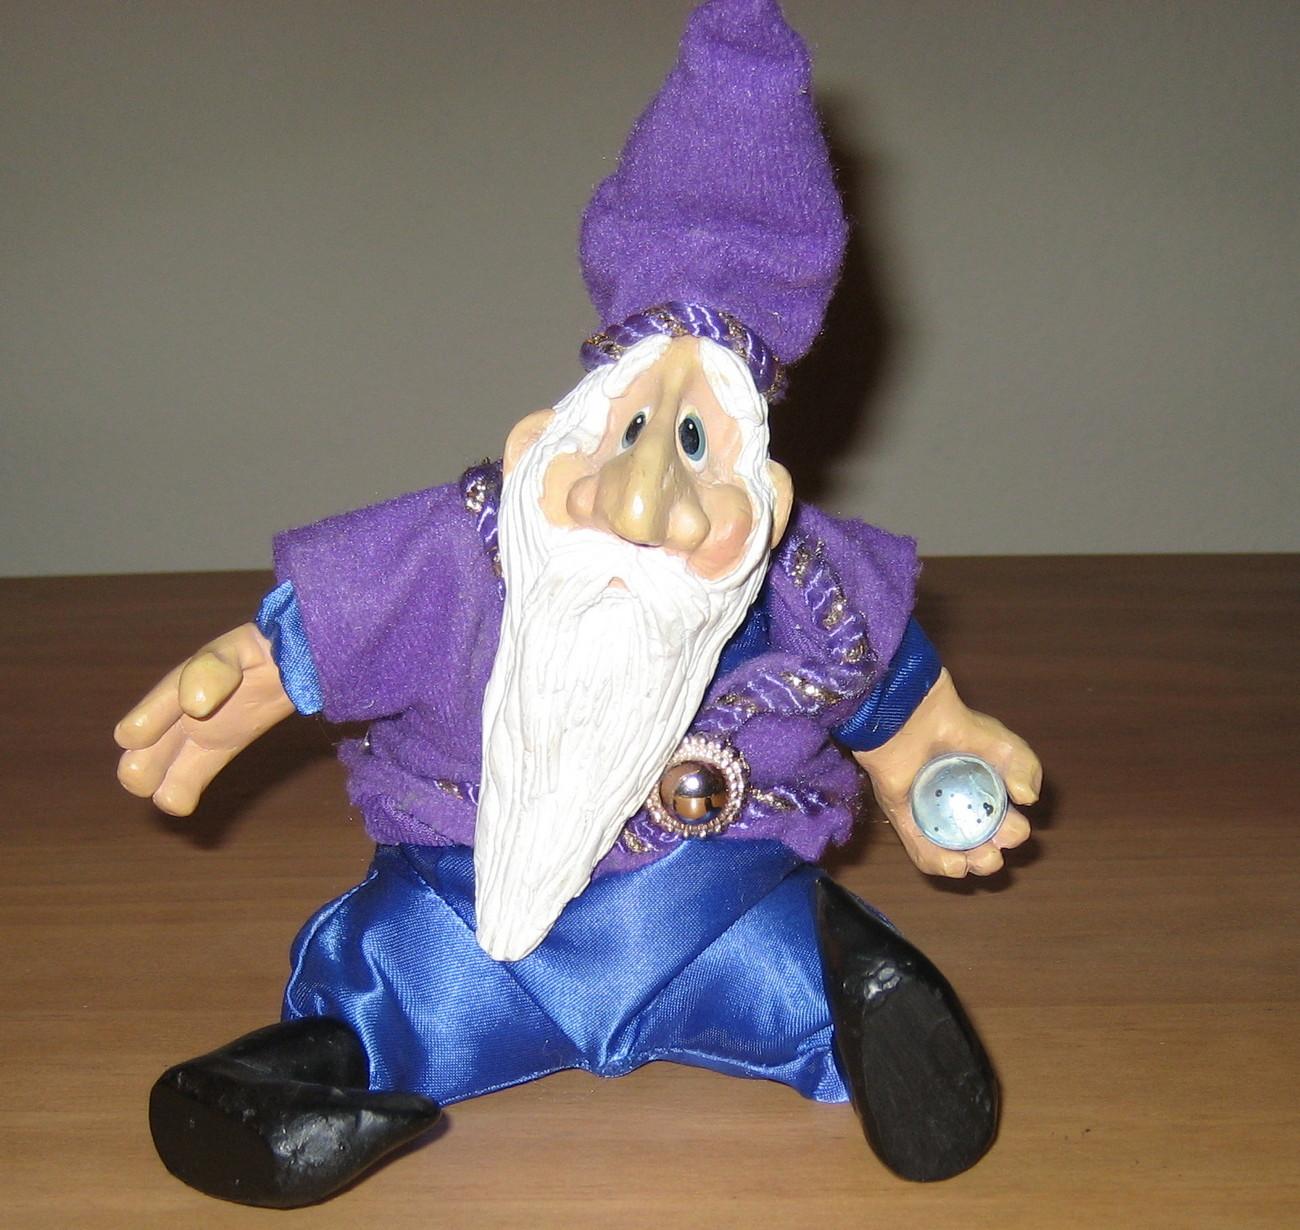 Abracadabra wizard